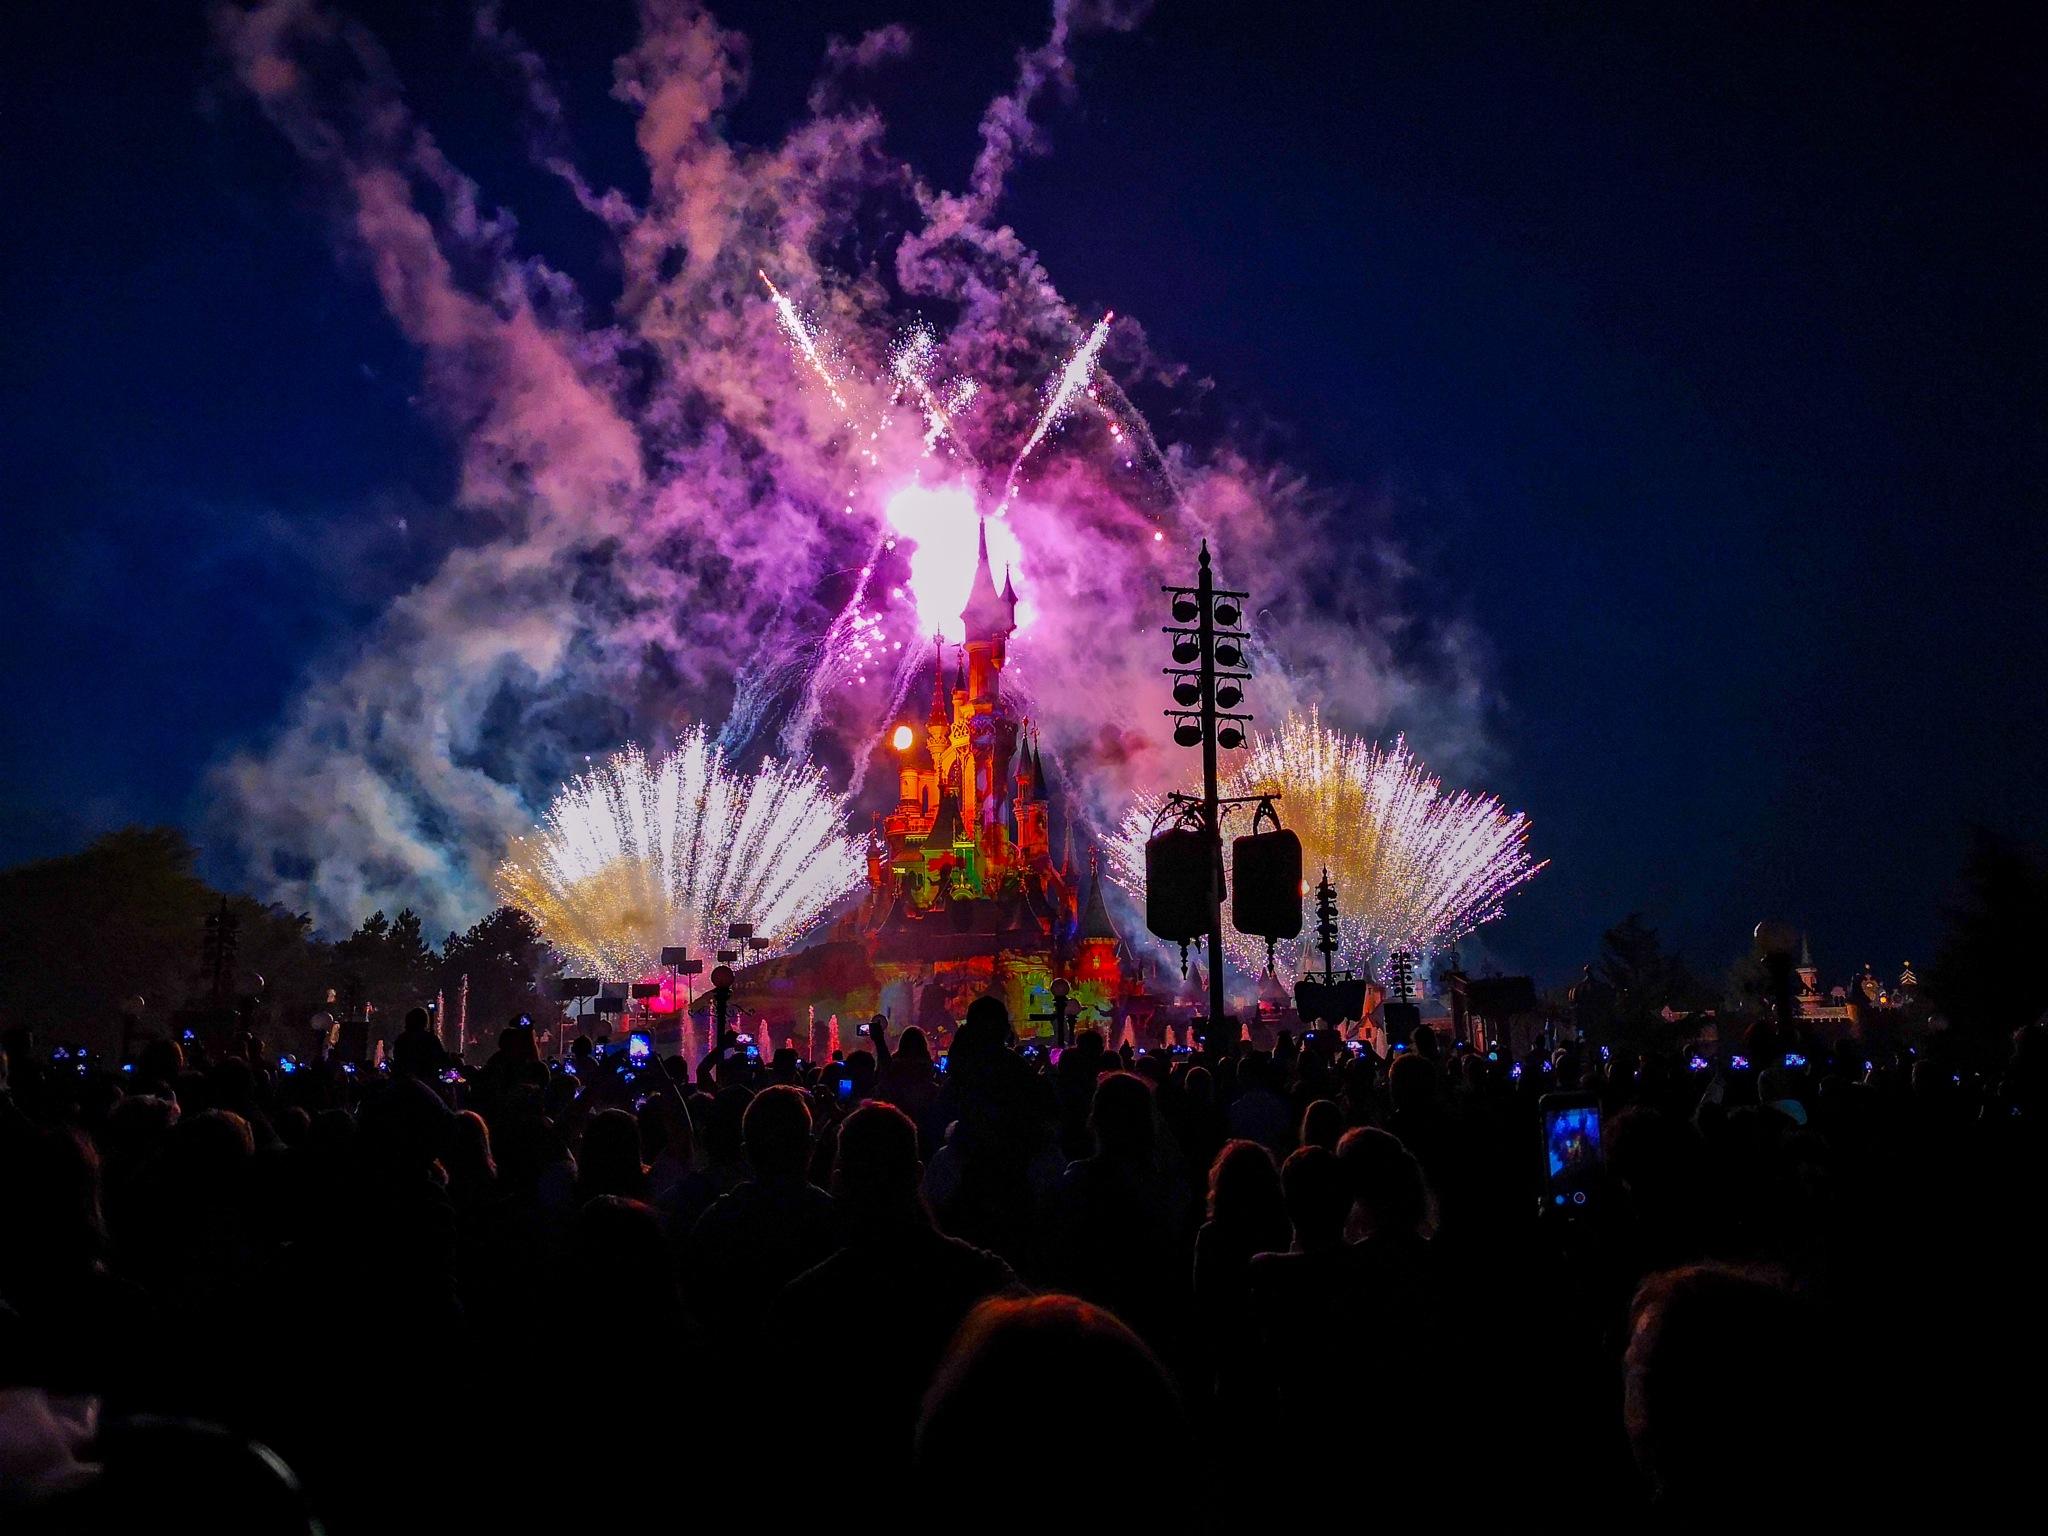 Disney Illumination Firework by Florent Raco